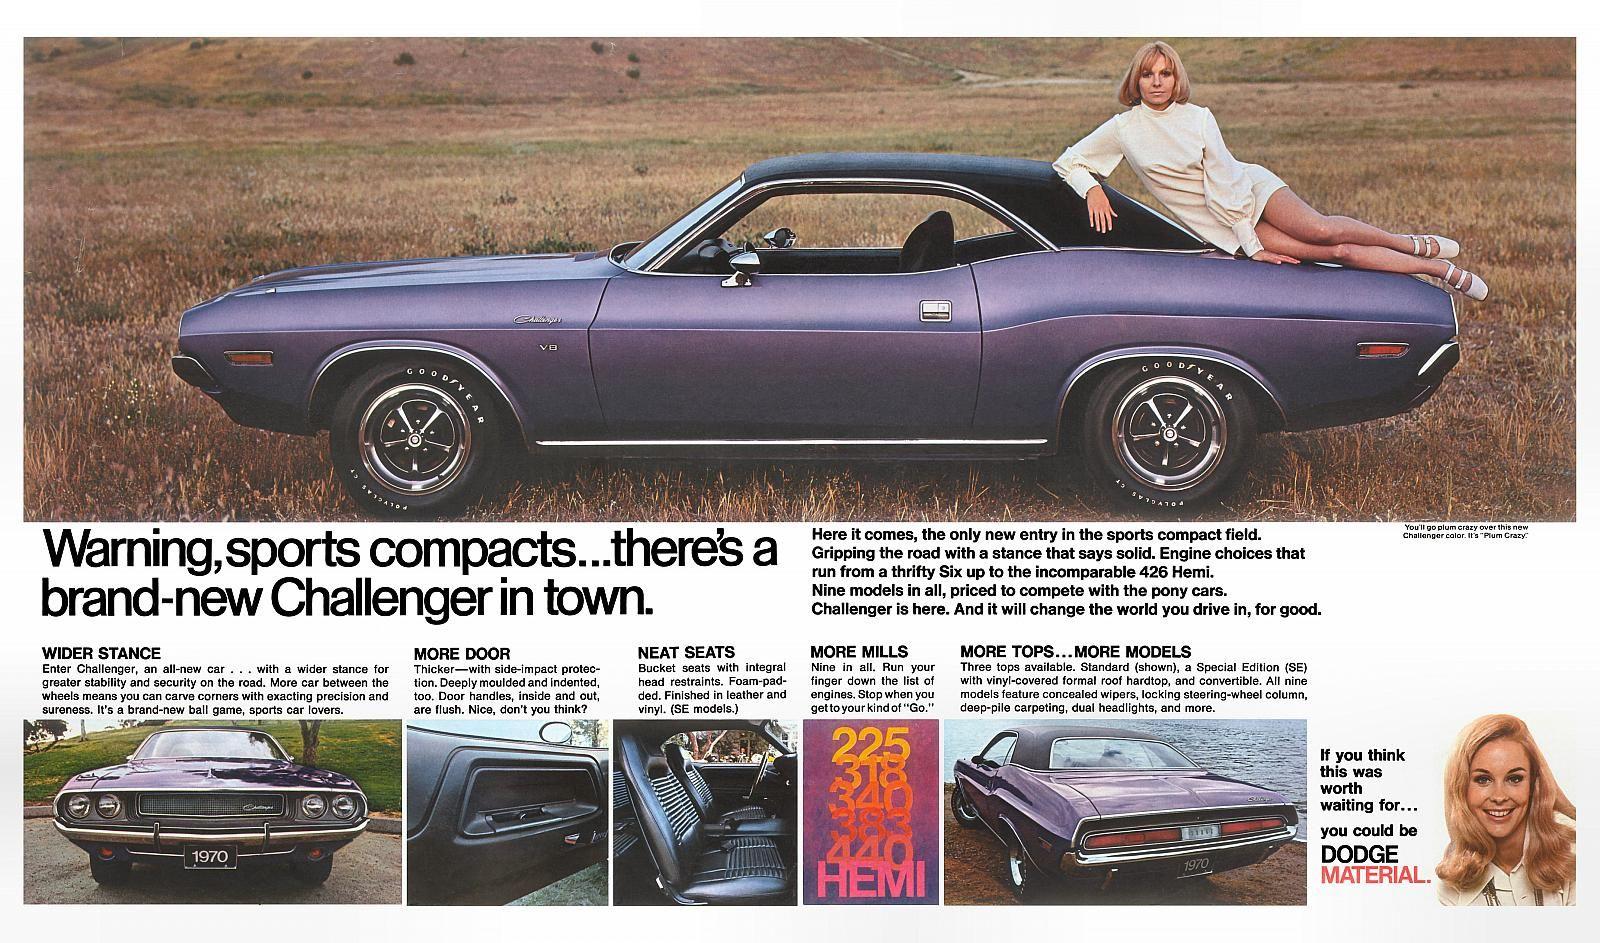 1970 Dodge Newspaper Insert 04 05 Challenger Dodge Automobile Advertising